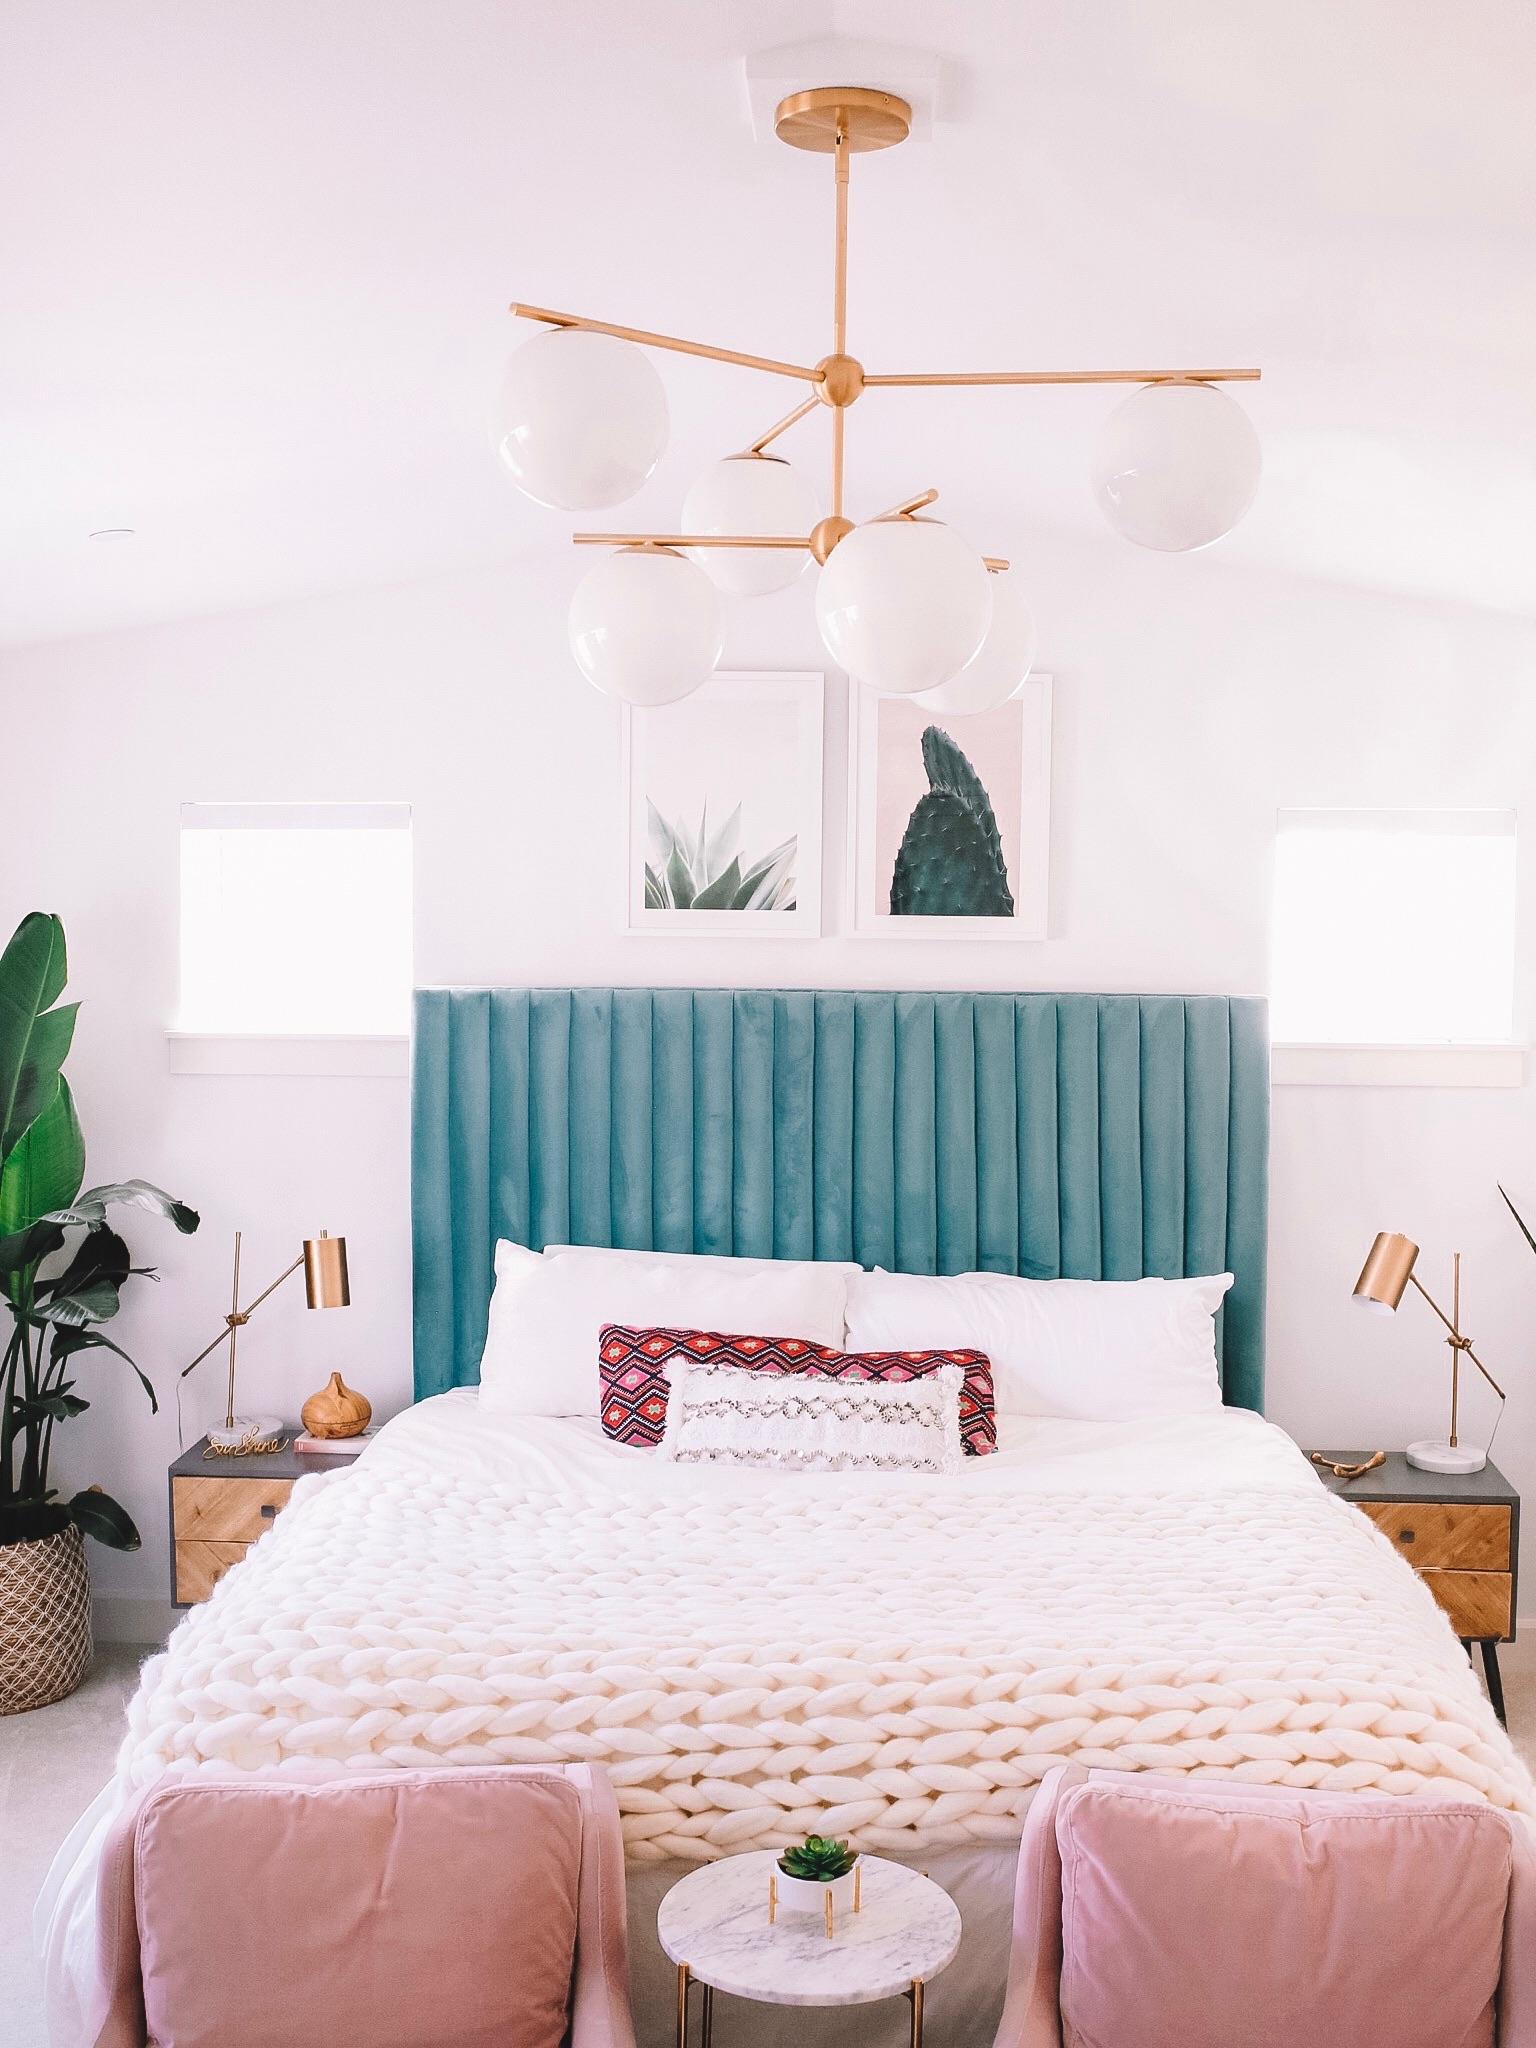 My Bedroom Decor | Gypsy Tan on Boho Bedroom Decor  id=75365